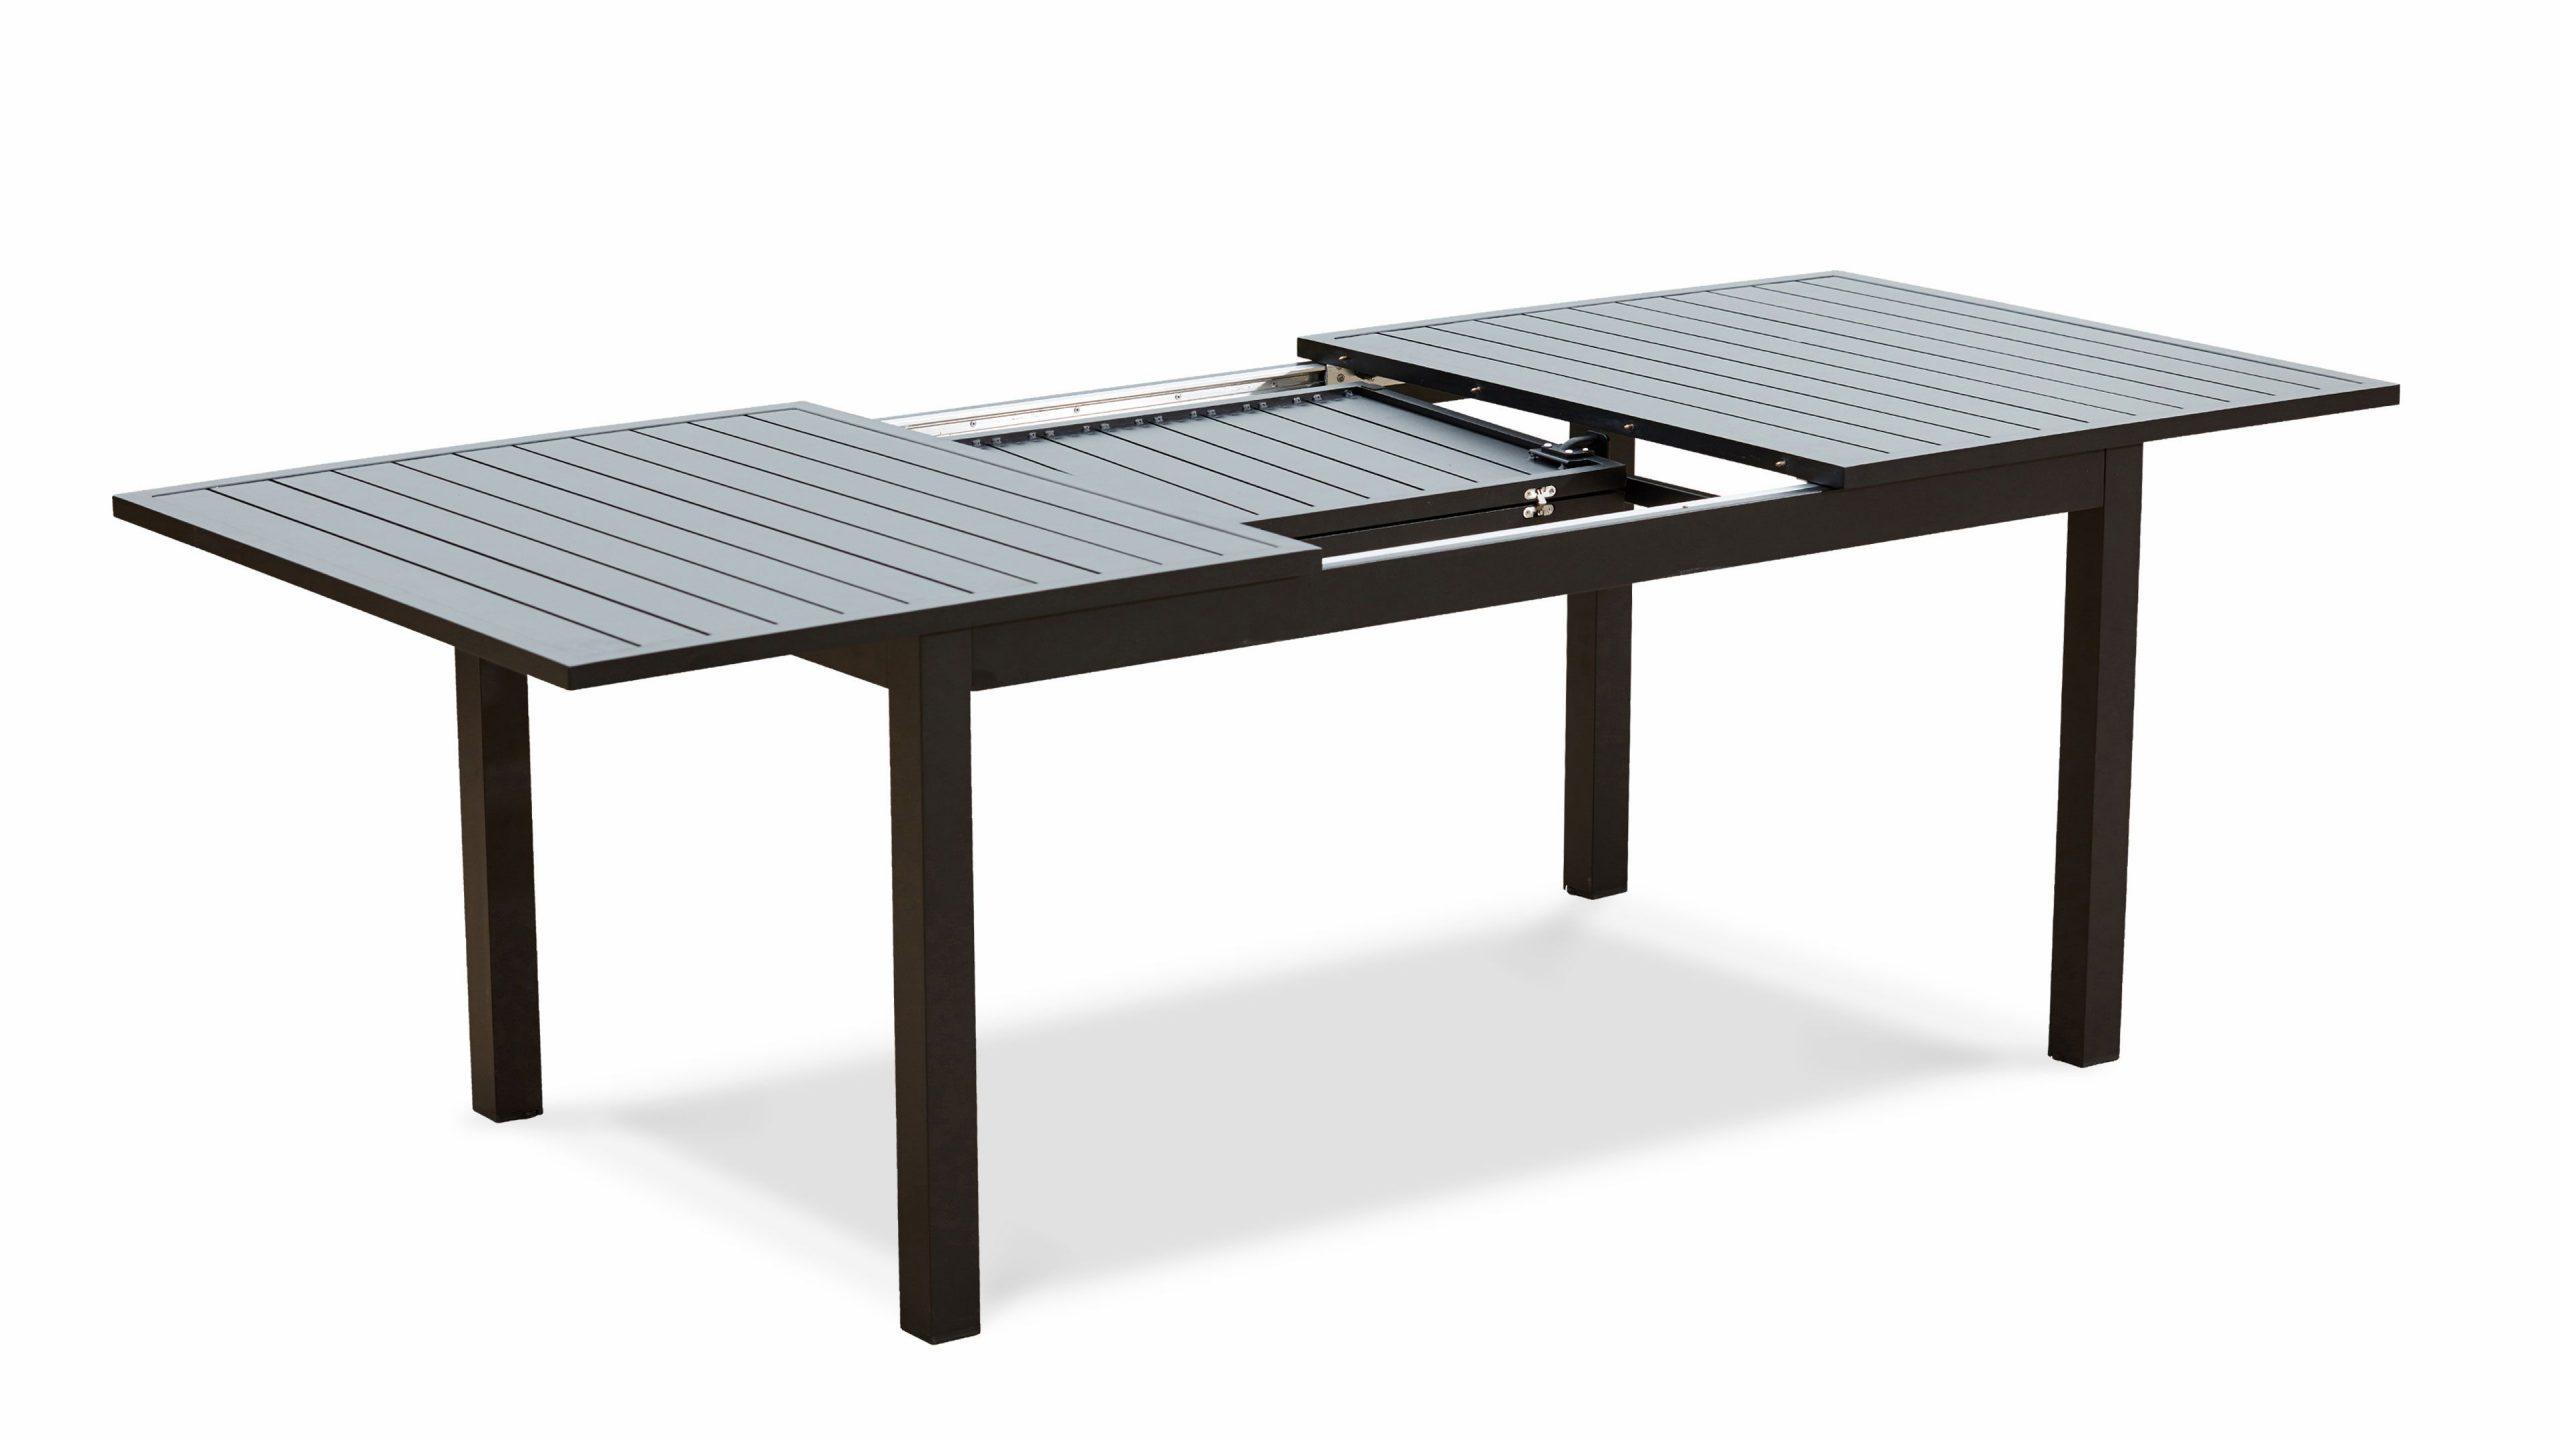 Table Jardin Extensible Rallonge 174/238 Cm Aluminium serapportantà Table Jardin Noire